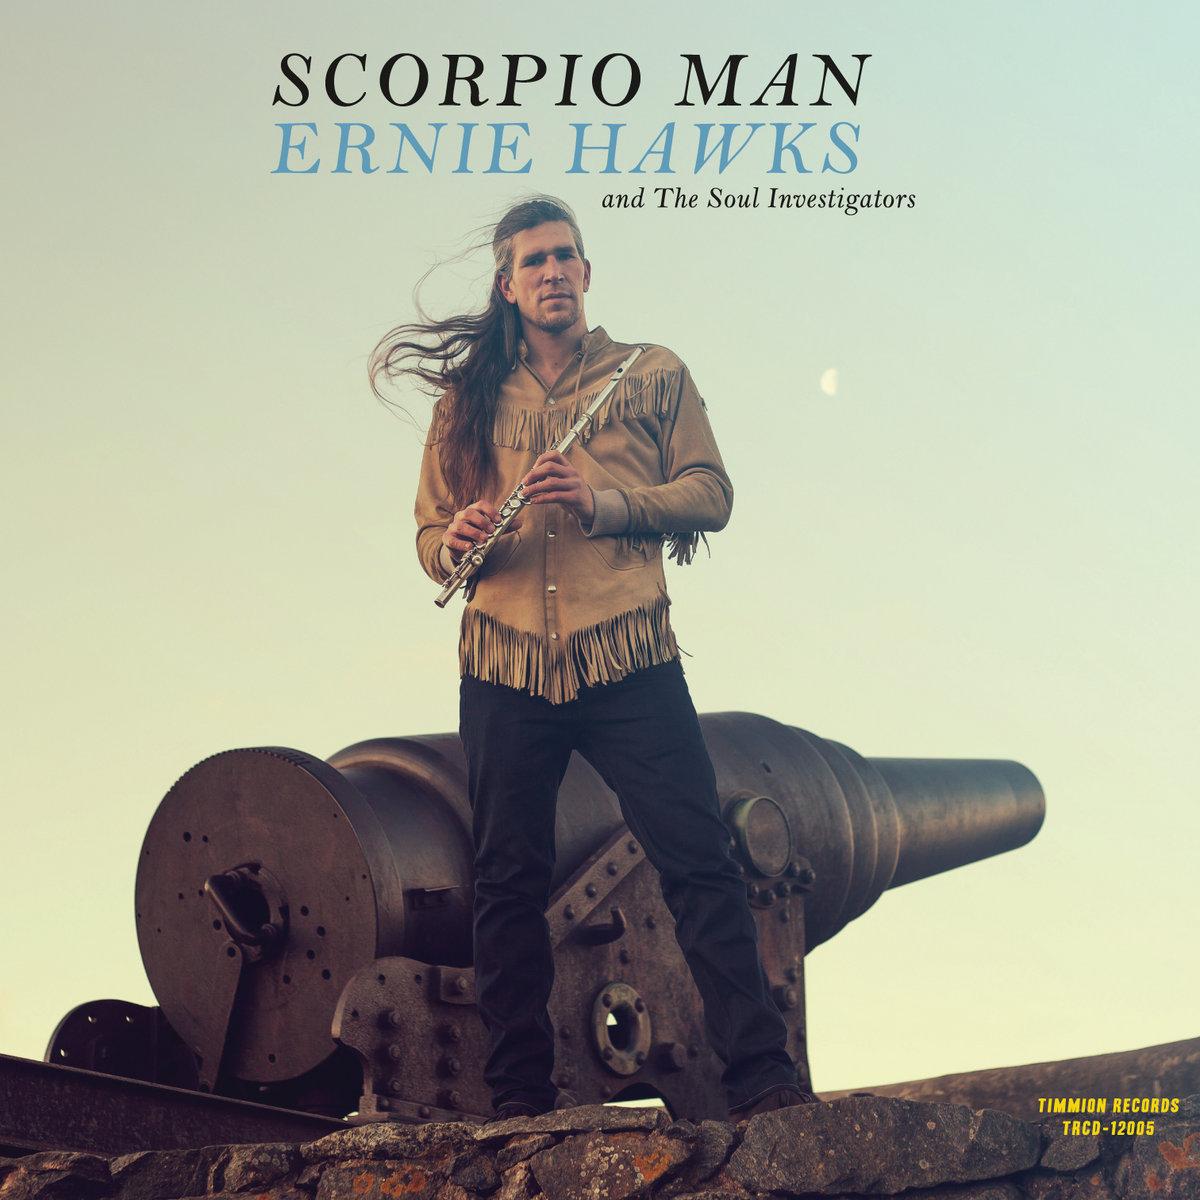 Scorpio Man Theme   Ernie Hawks and The Soul Investigators